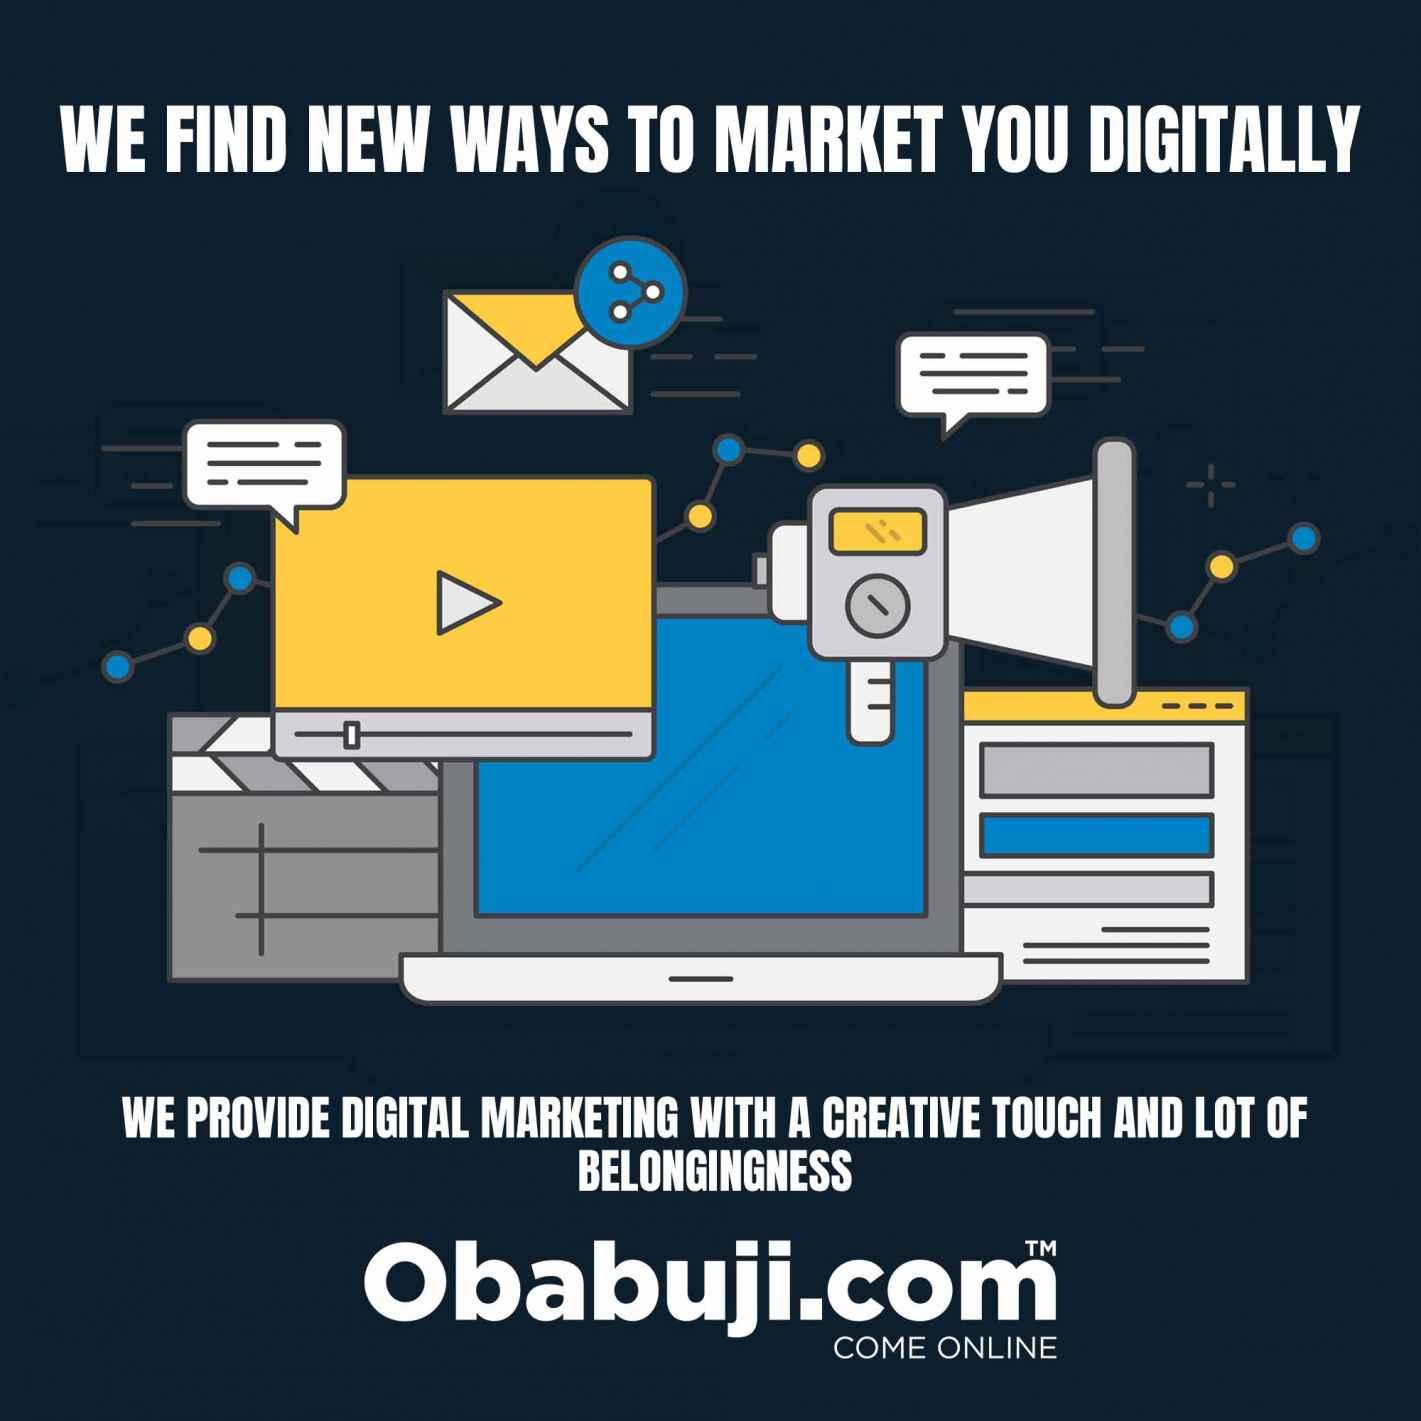 OBABUJI digital marketing company